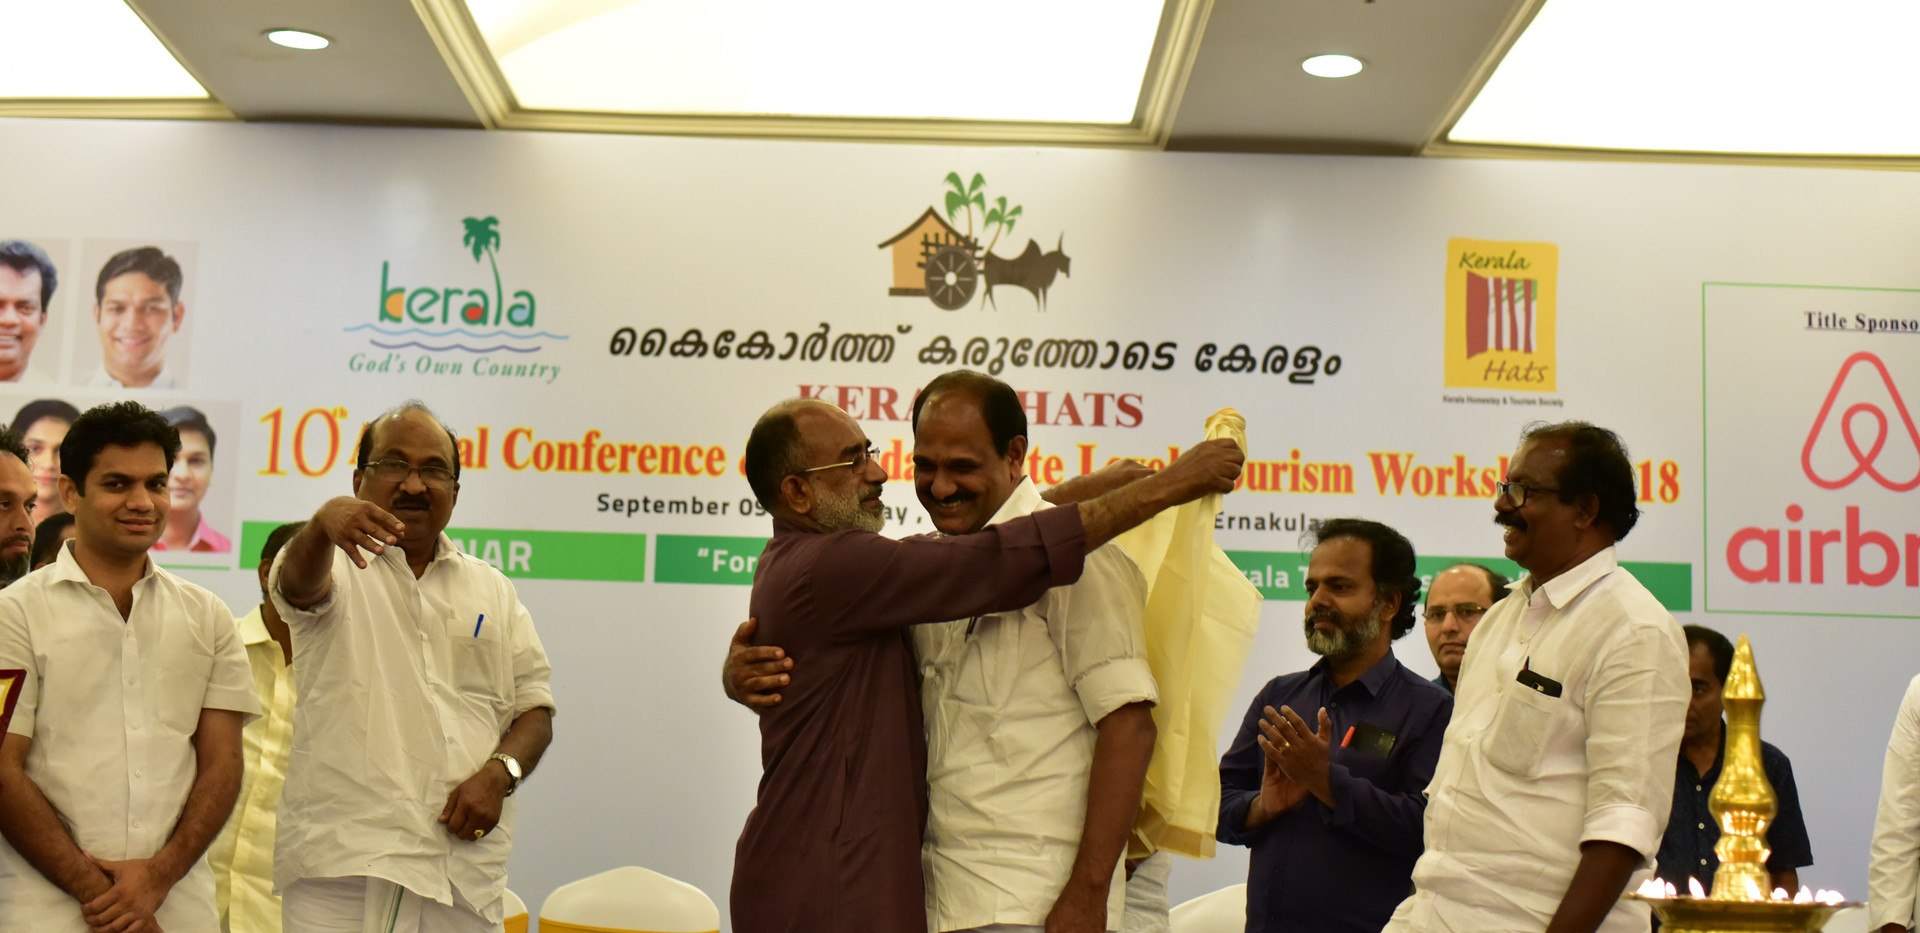 Best B&B KERALA HATS 17-18 Rosegardens Homestay Munnar Receiving the Award for the Best Homestay in Kerala